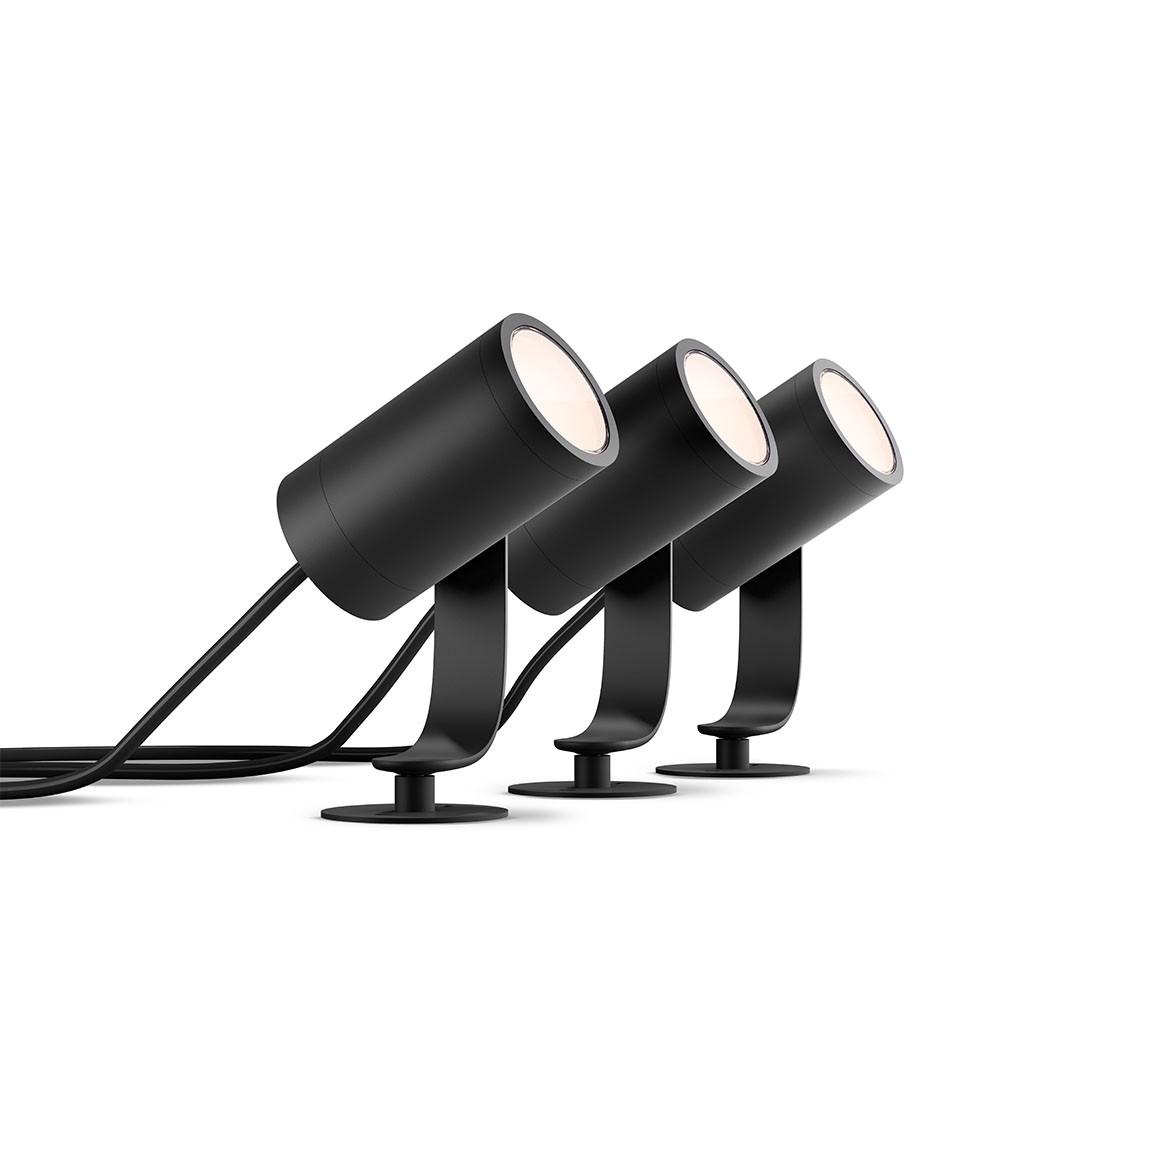 Philips Hue LED Spot Lily Base Kit (3er-Set) - Schwarz